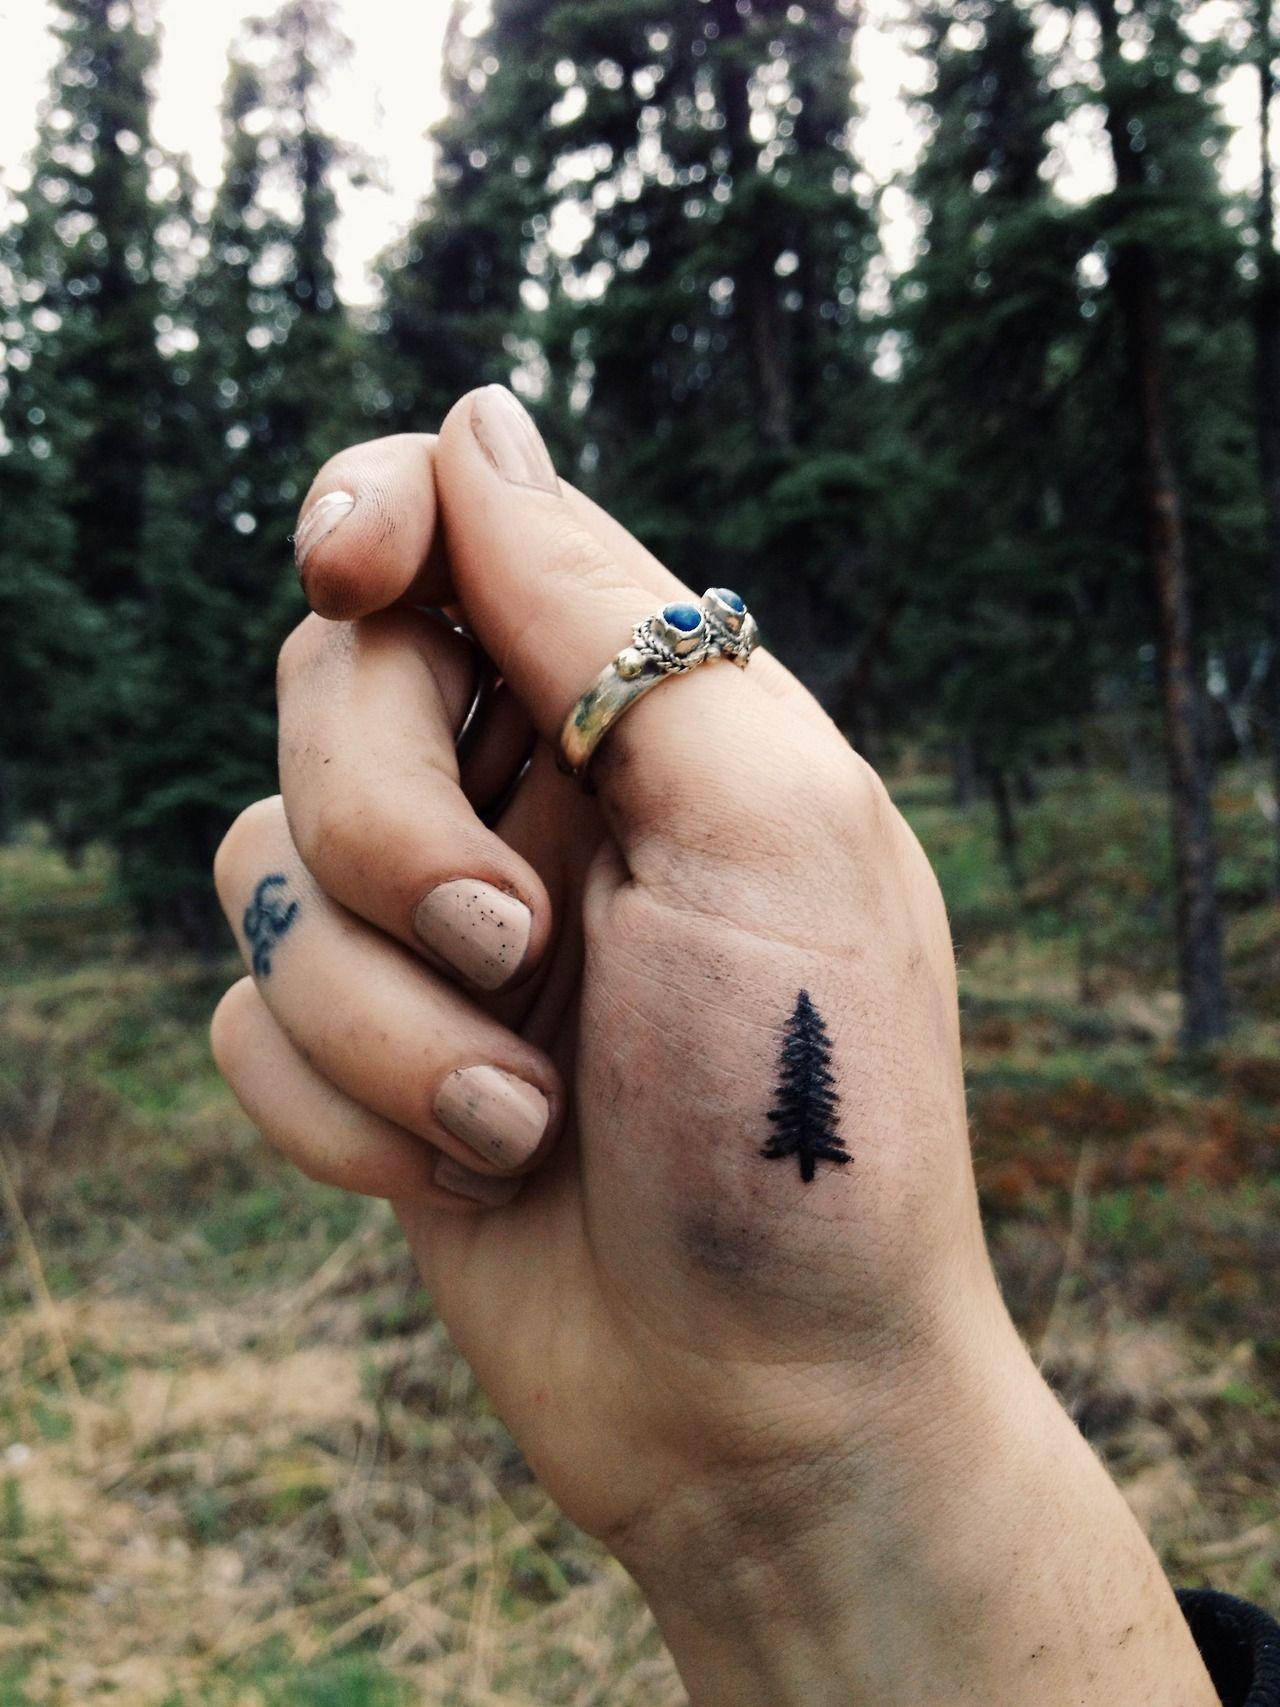 Tattoo Love The Placement Tattoos Pine Tattoo Hand Tattoos